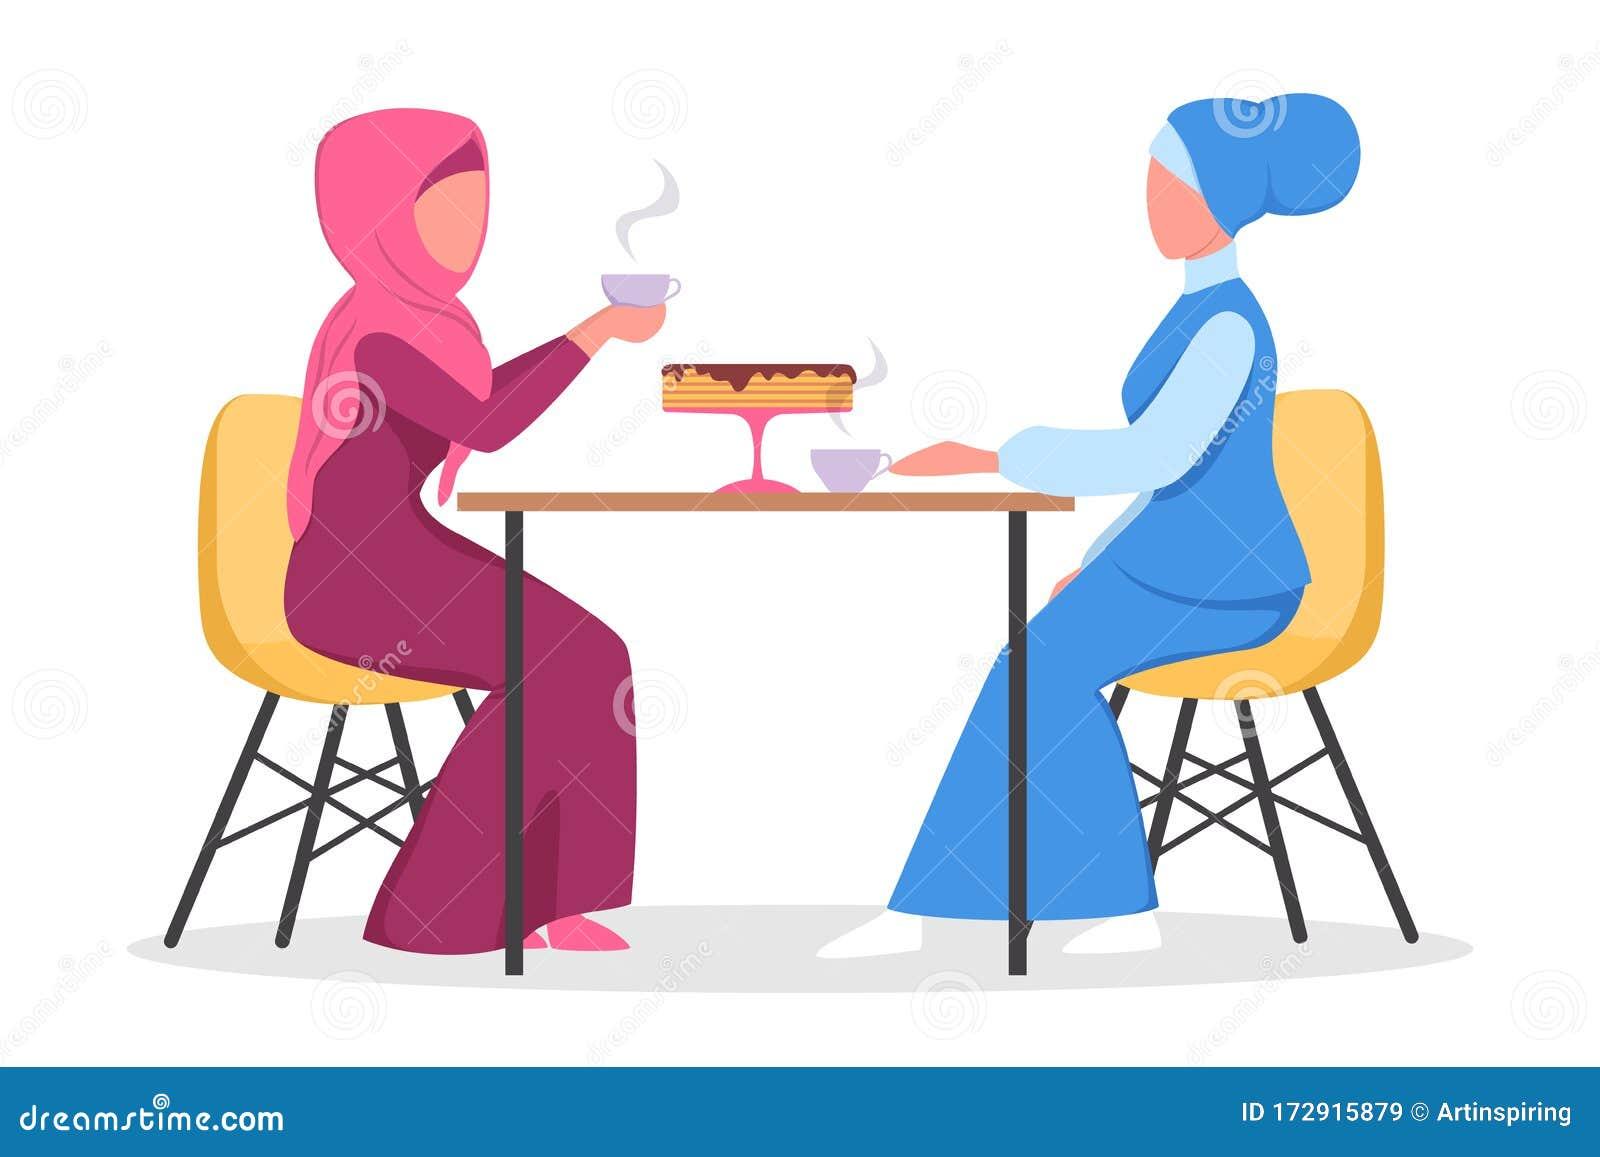 Muslim Cafe Stock Illustrations 650 Muslim Cafe Stock Illustrations Vectors Clipart Dreamstime